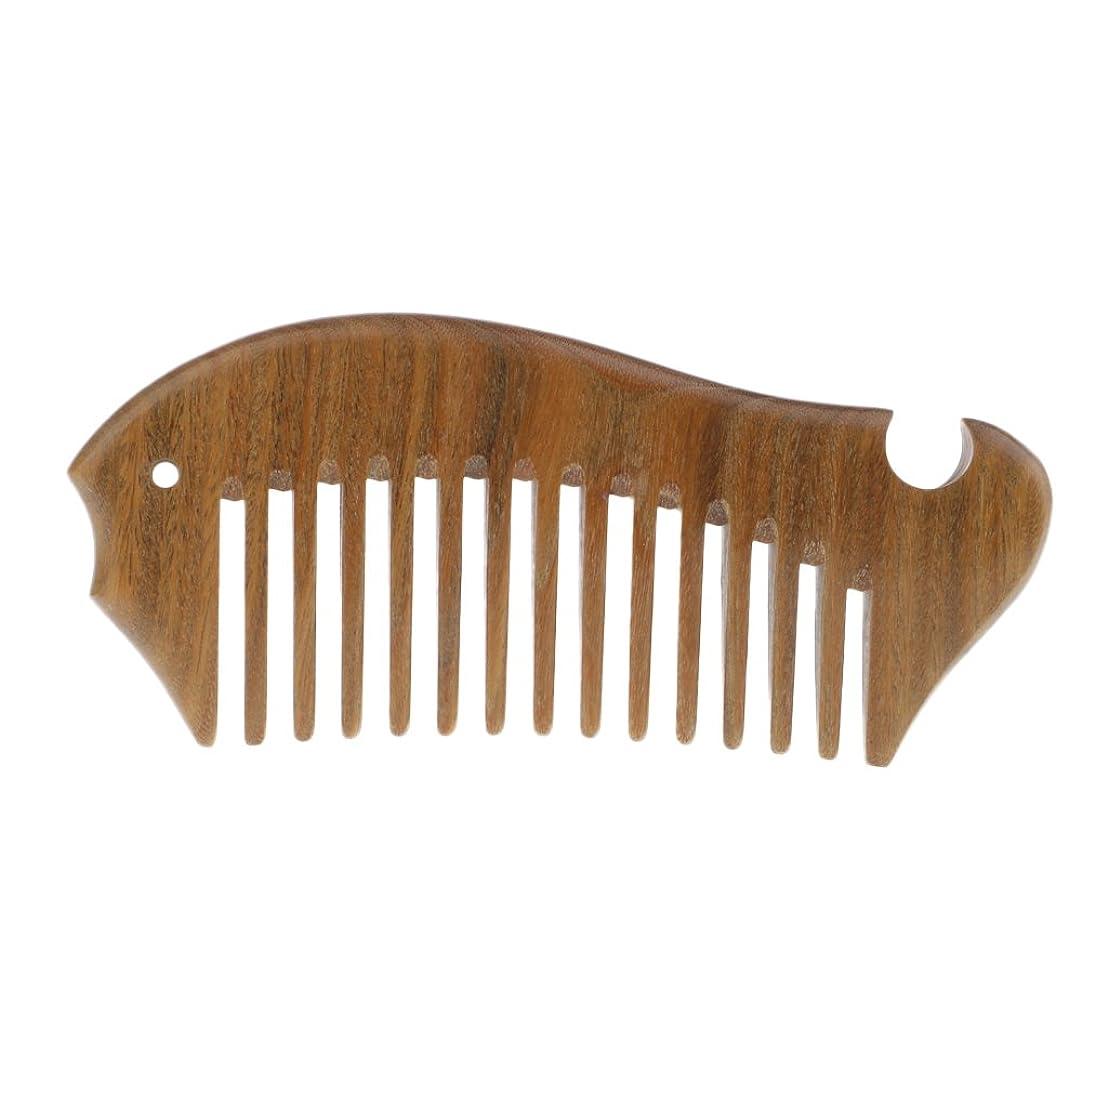 gazechimp 木製櫛 帯電防止櫛 ヘアコーム 頭皮 ケア マッサージ